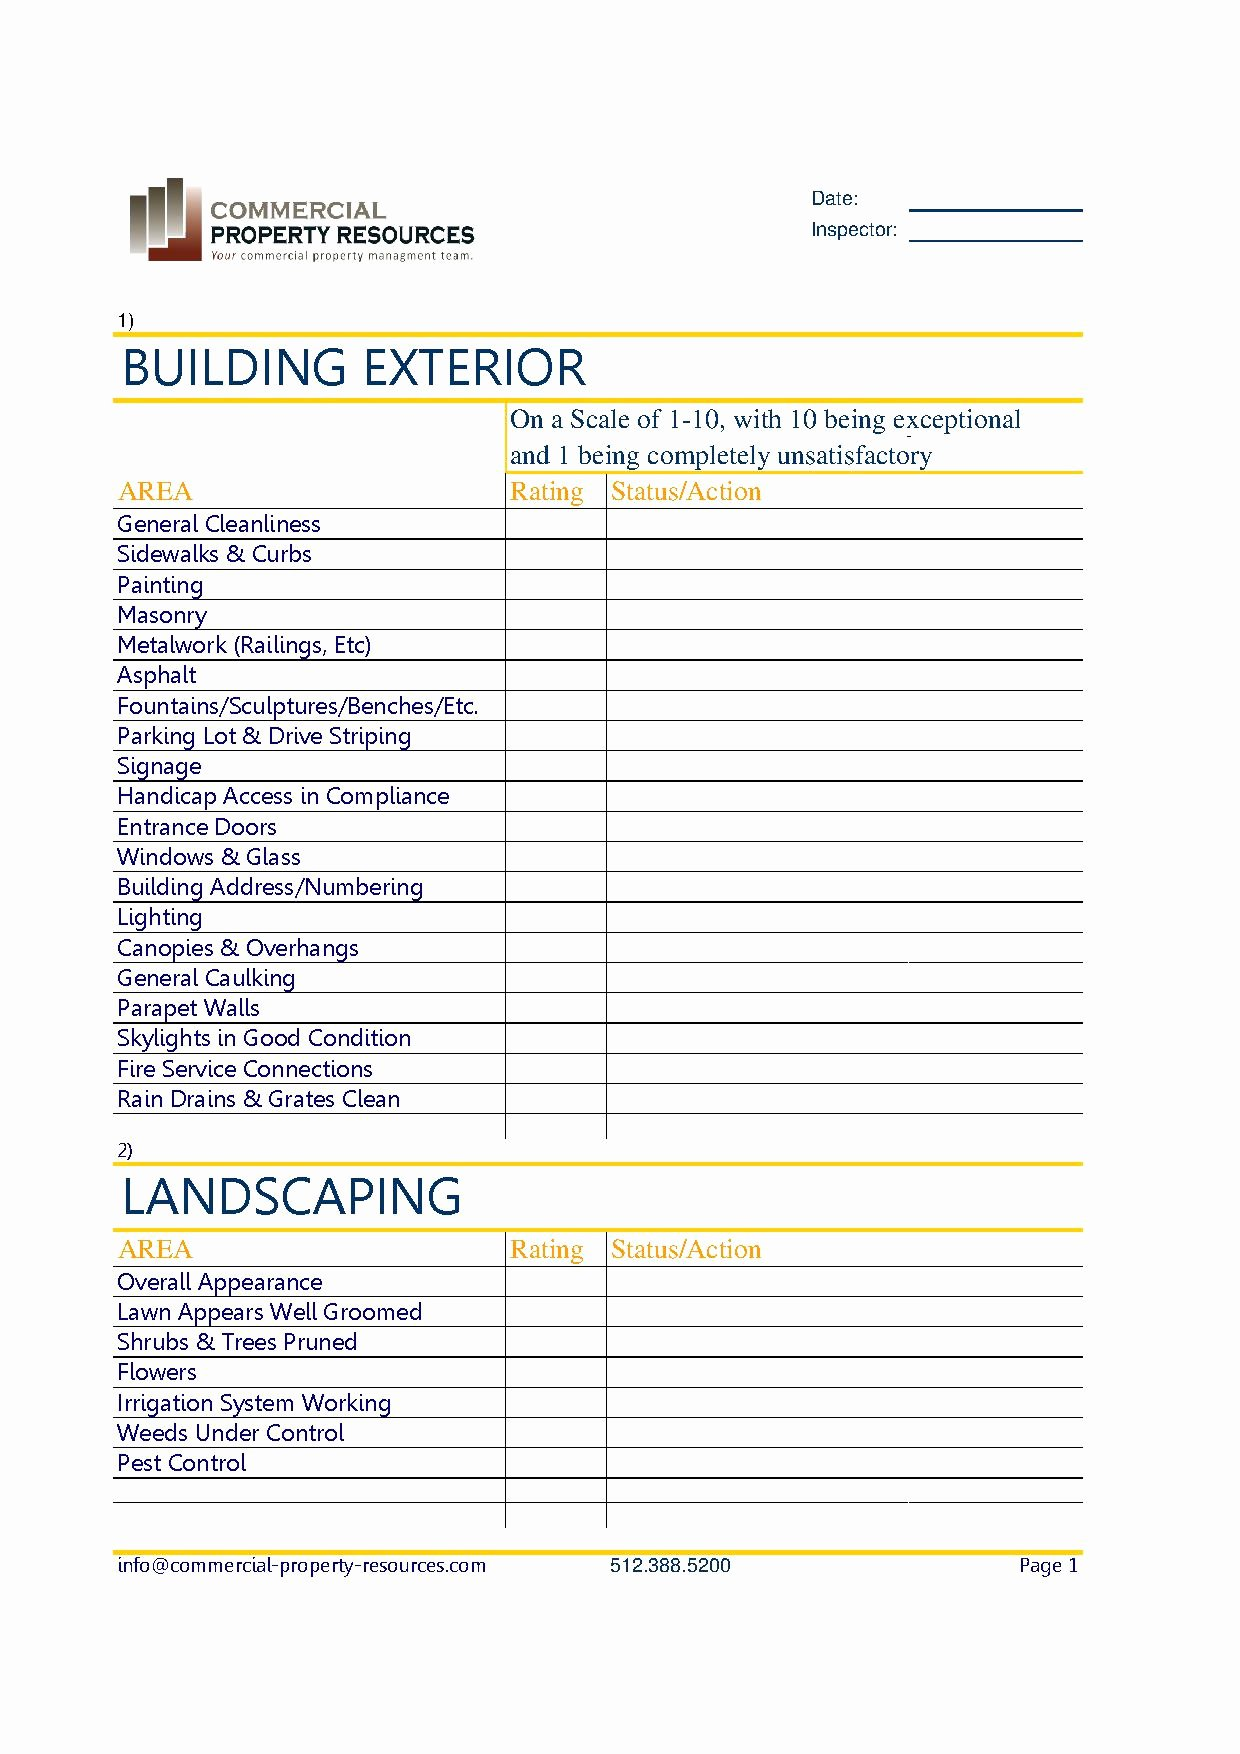 Property Management Maintenance Checklist Template Best Of Maintenance Checklists Mercial Property Resources